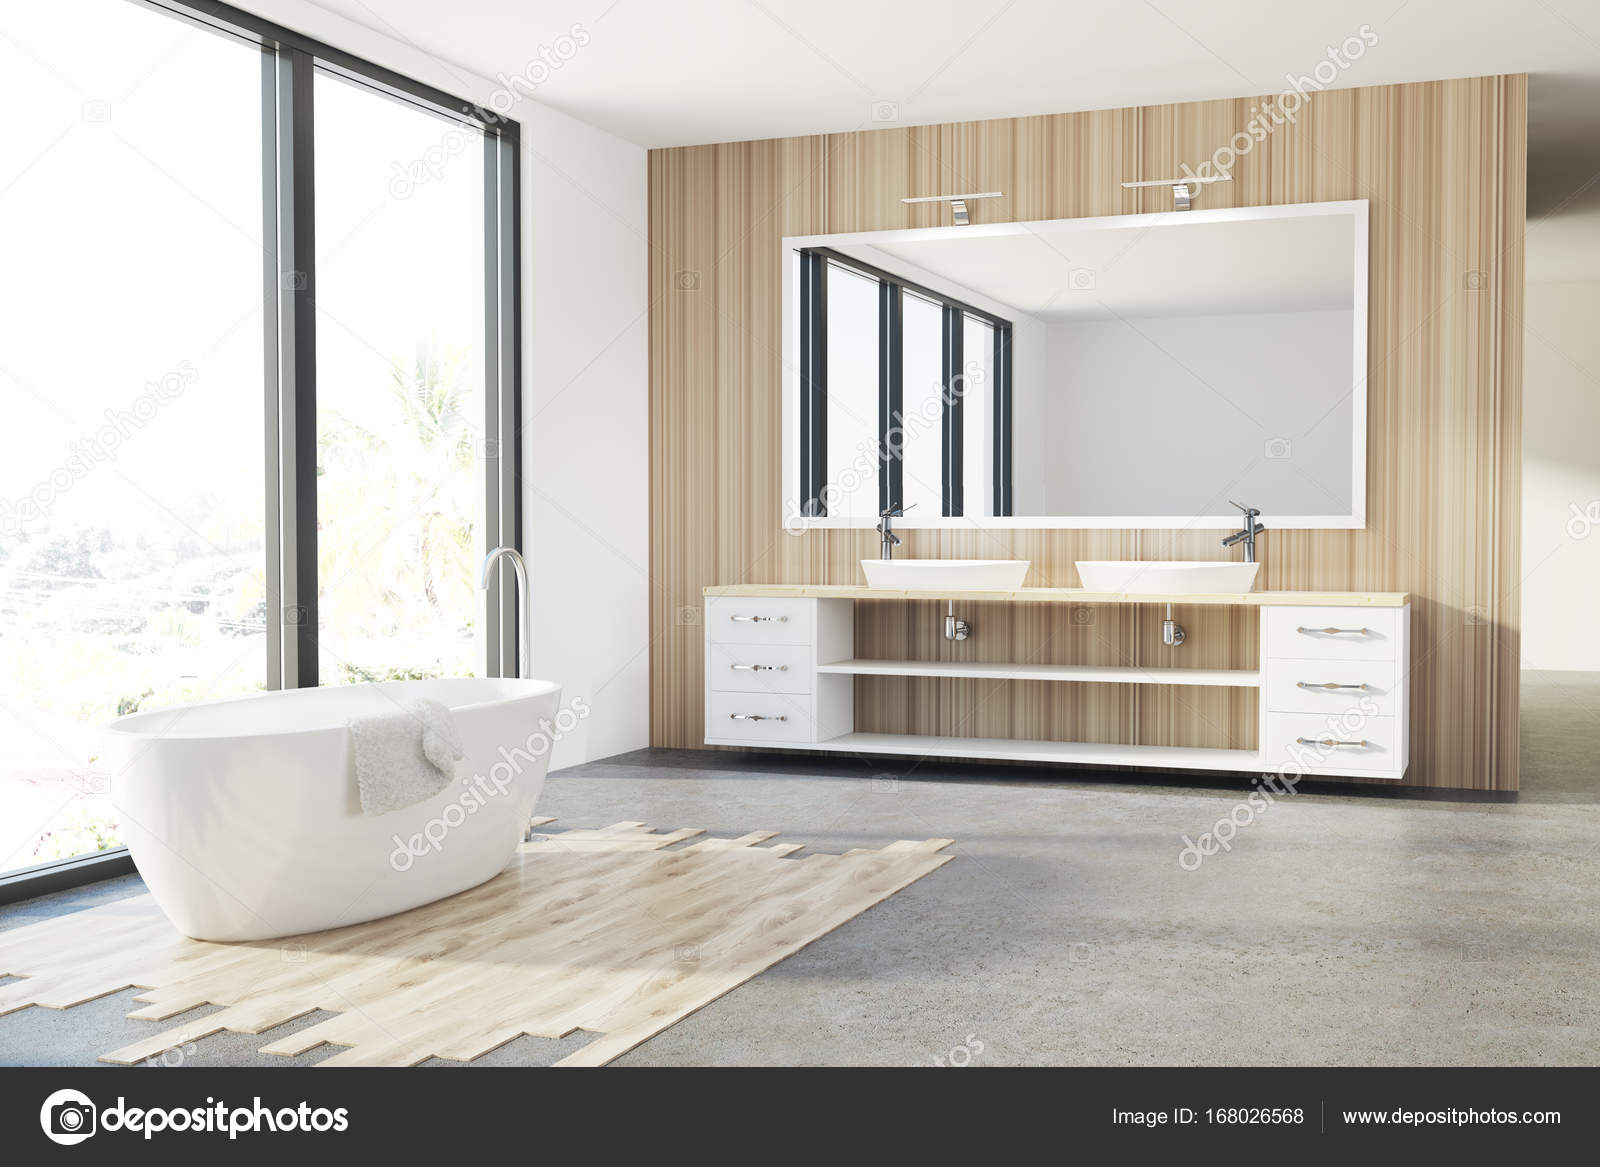 Houten badkamer, witte badkuip, wastafel, loft — Stockfoto ...